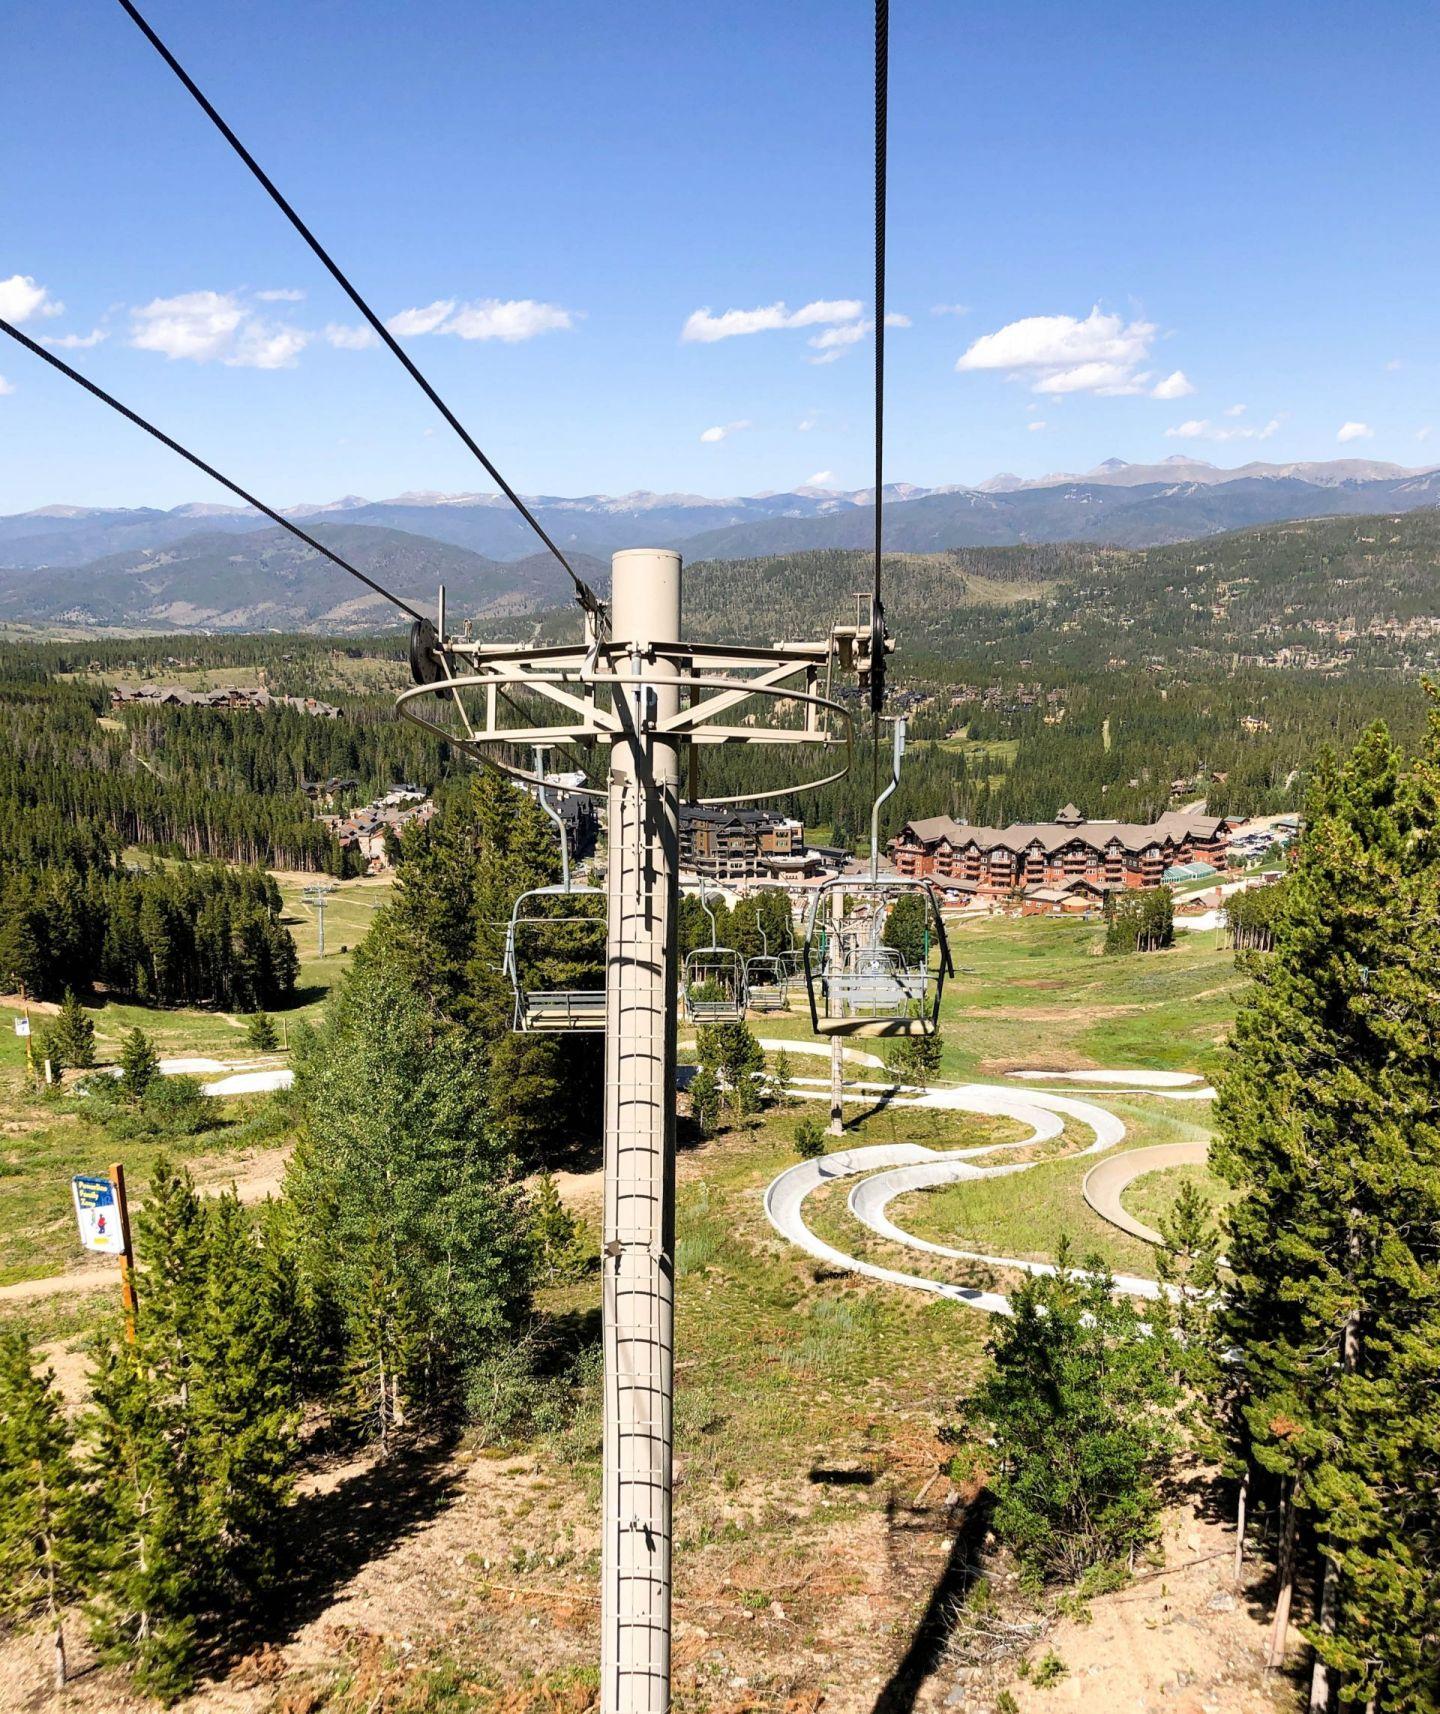 breckenridge top of mountain - breckenridge alpine slide